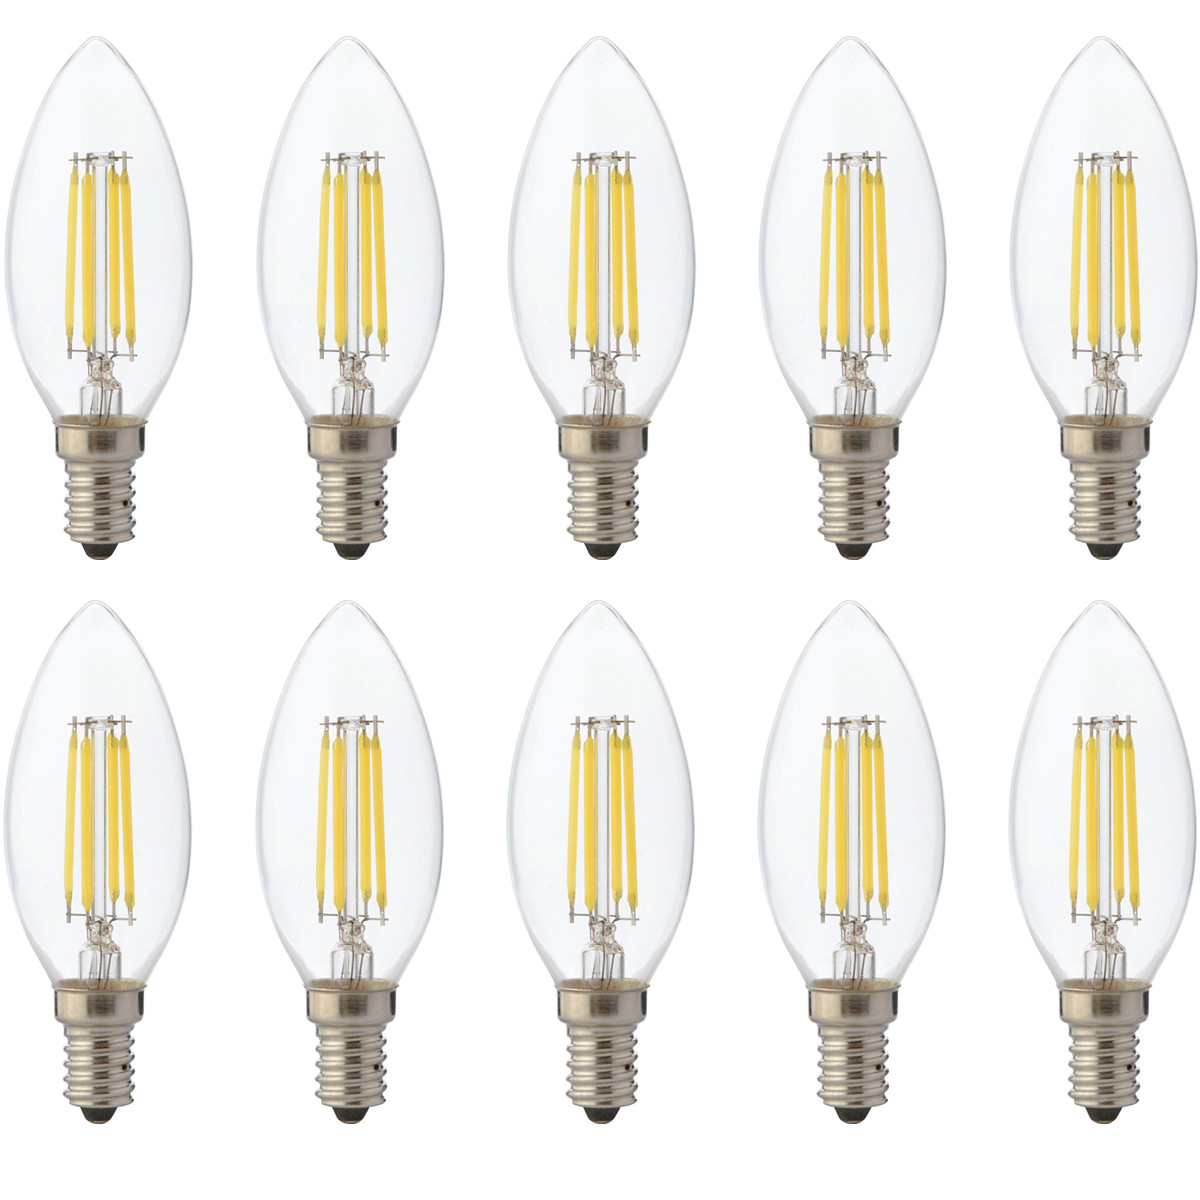 LED Lamp 10 Pack - Kaarslamp - Filament - E14 Fitting - 6W Dimbaar - Warm Wit 2700K